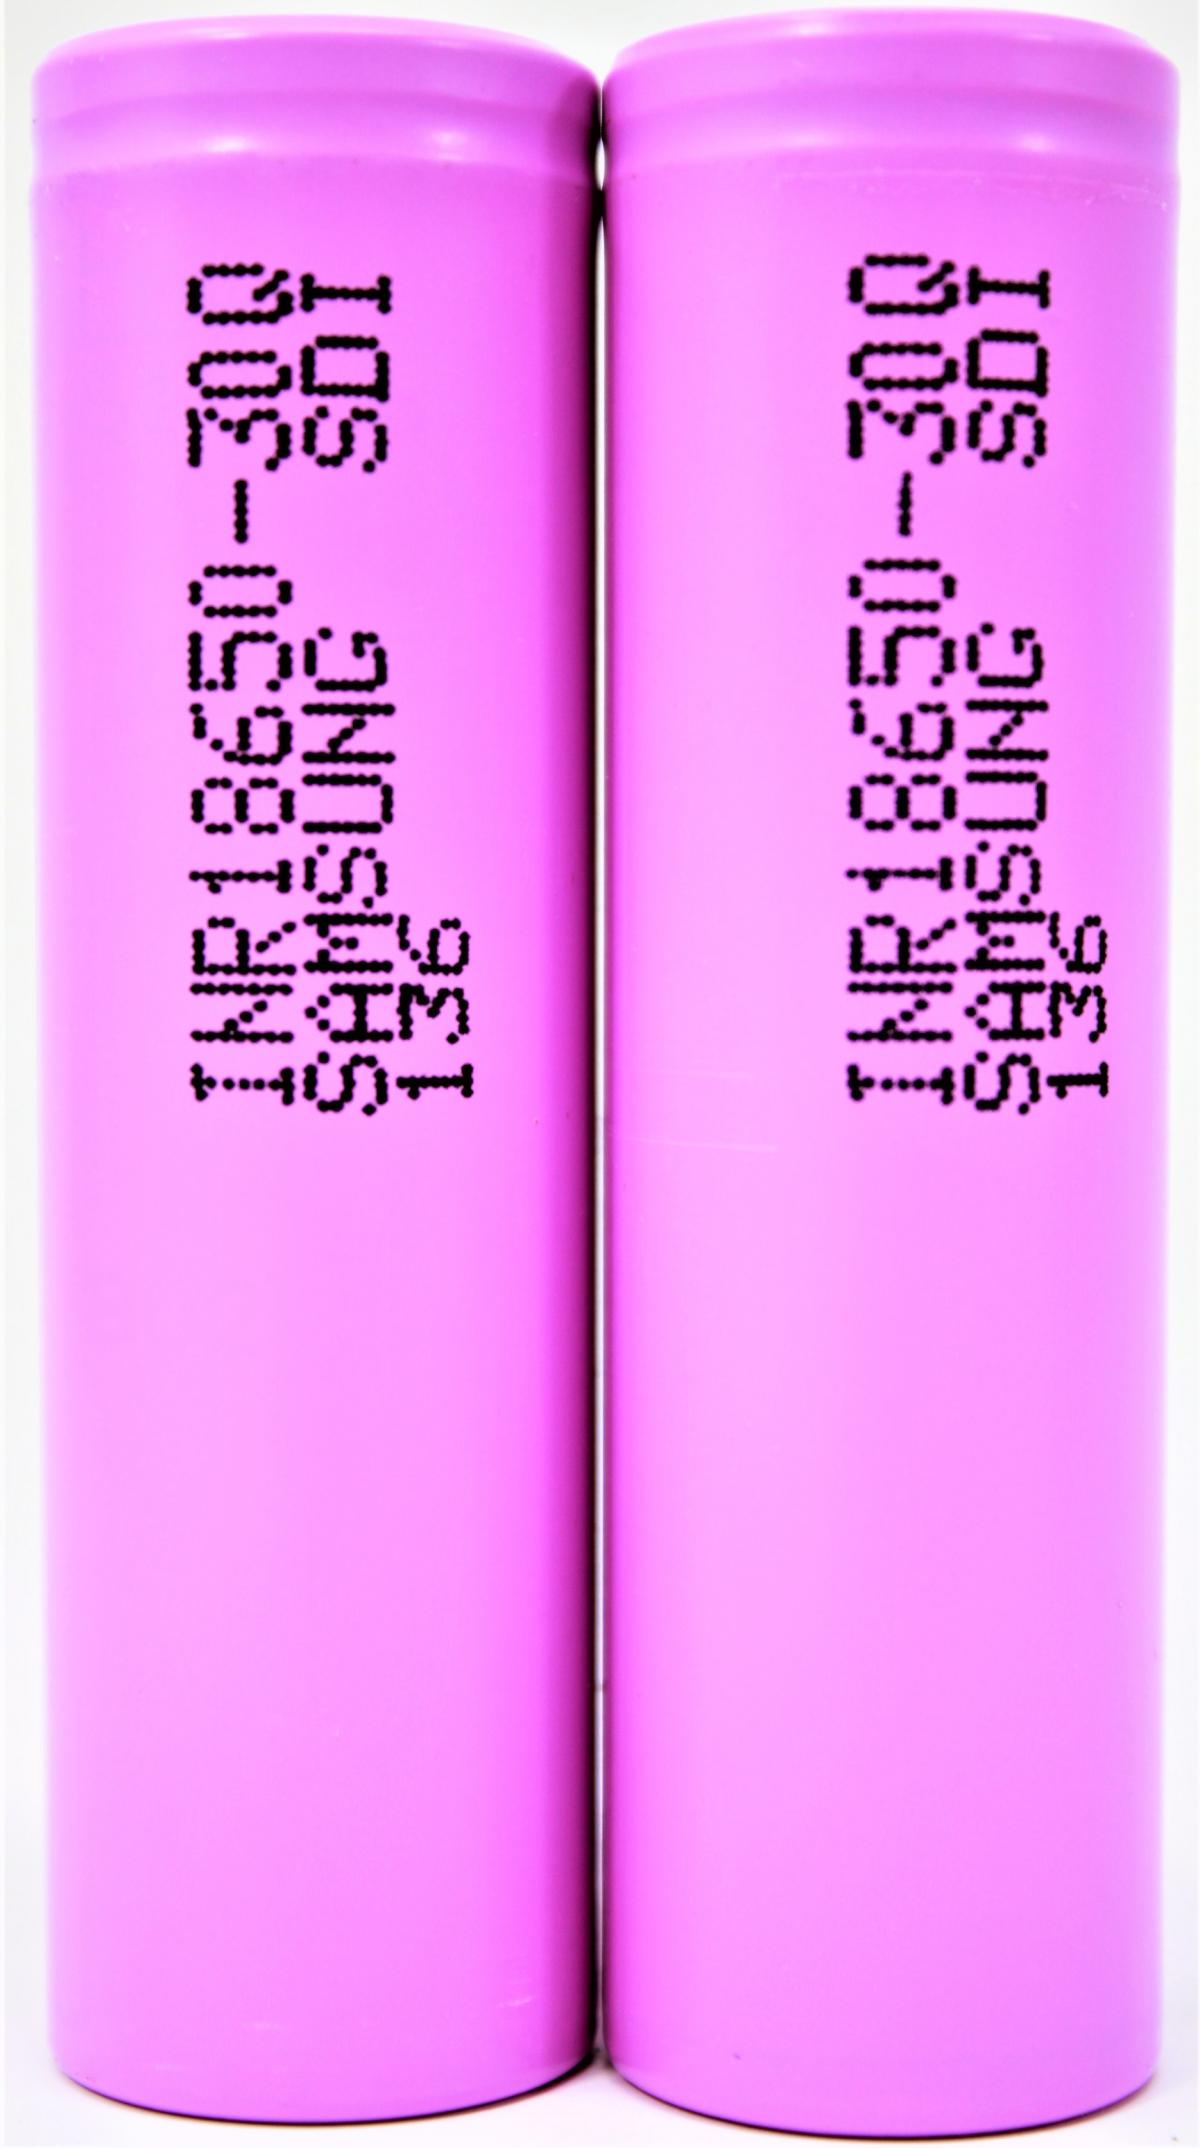 $6 99 SAMSUNG 30Q BATTERIES FLAT TOP RECHARGEABLE LITHIUM